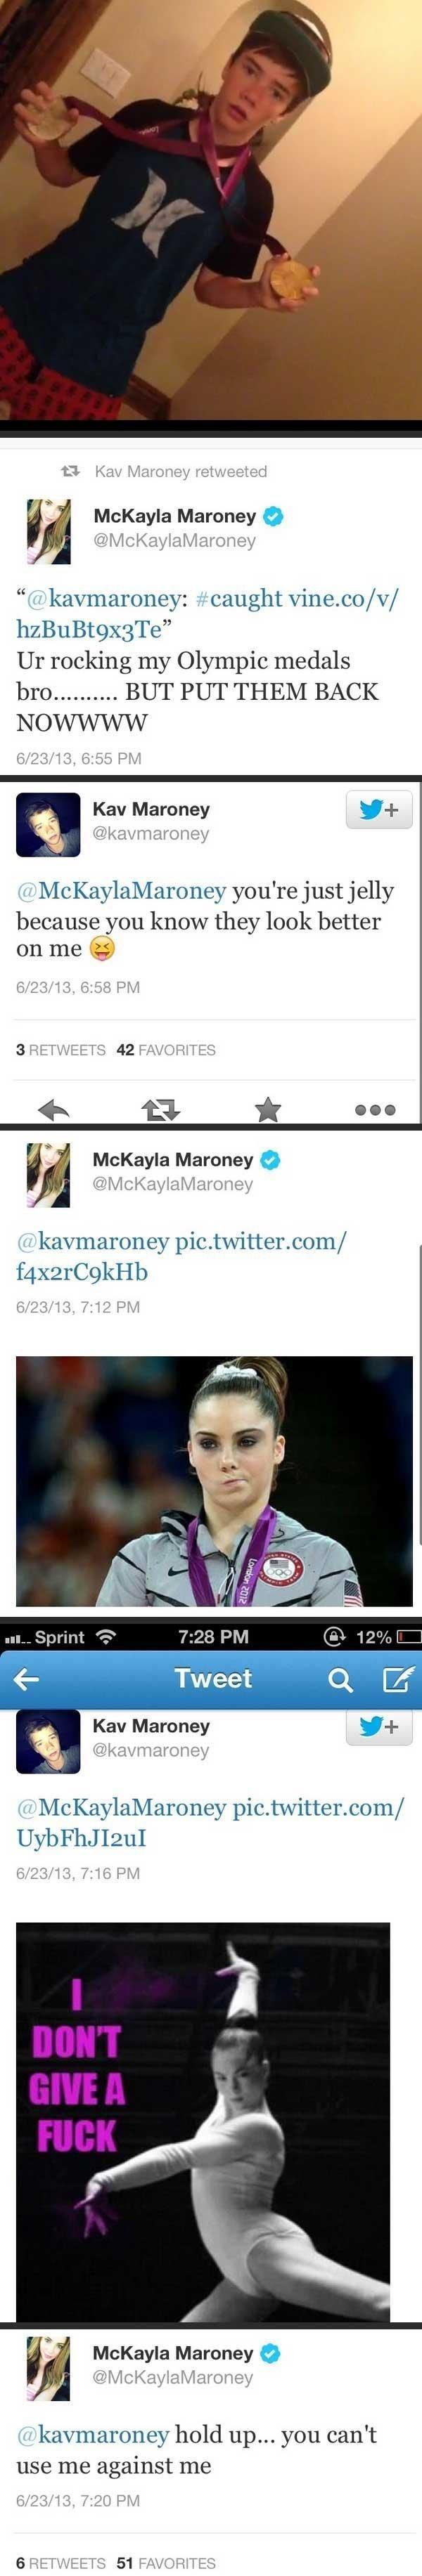 "Put´em down!!!!. . Nav Maroney retweeted W, Mckayla Maroney O Ur rocking my Olympic medals NOWNOW 7 Kav Maroney '"" an you' re just jelly because you know they l asdasdasdasd"